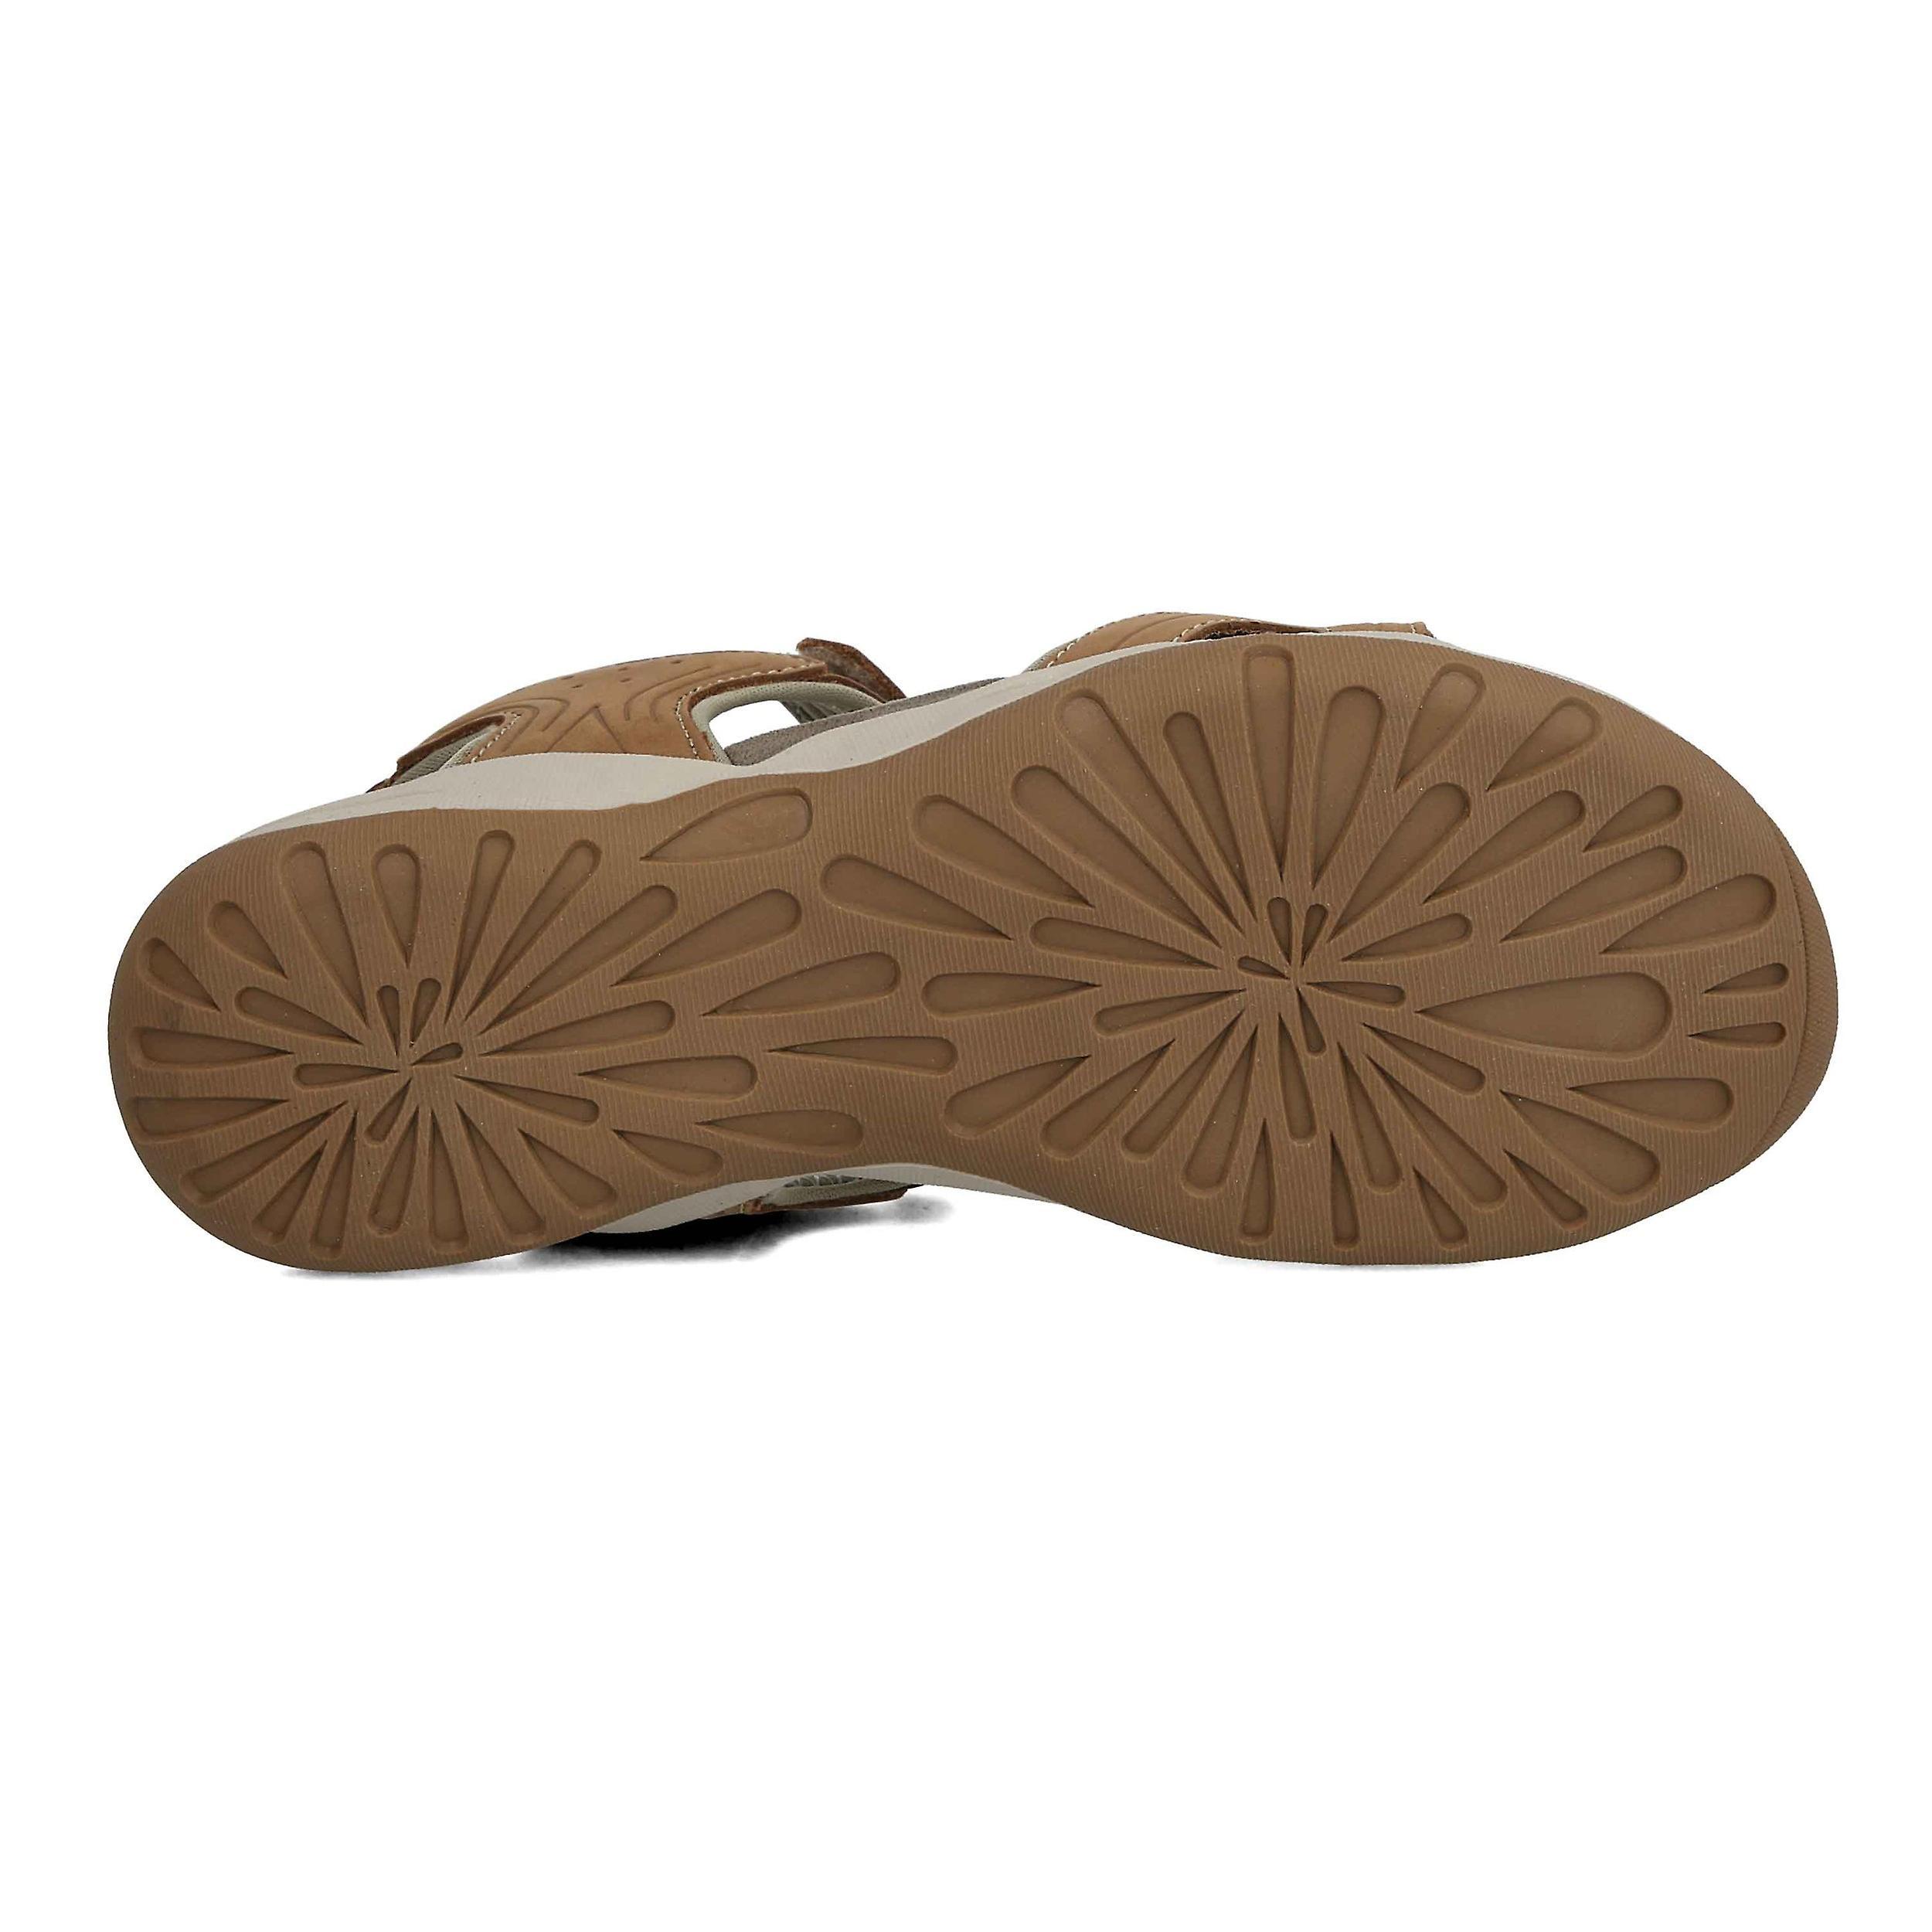 Hi-tec Silky Women's Walking Sandals - Ss20